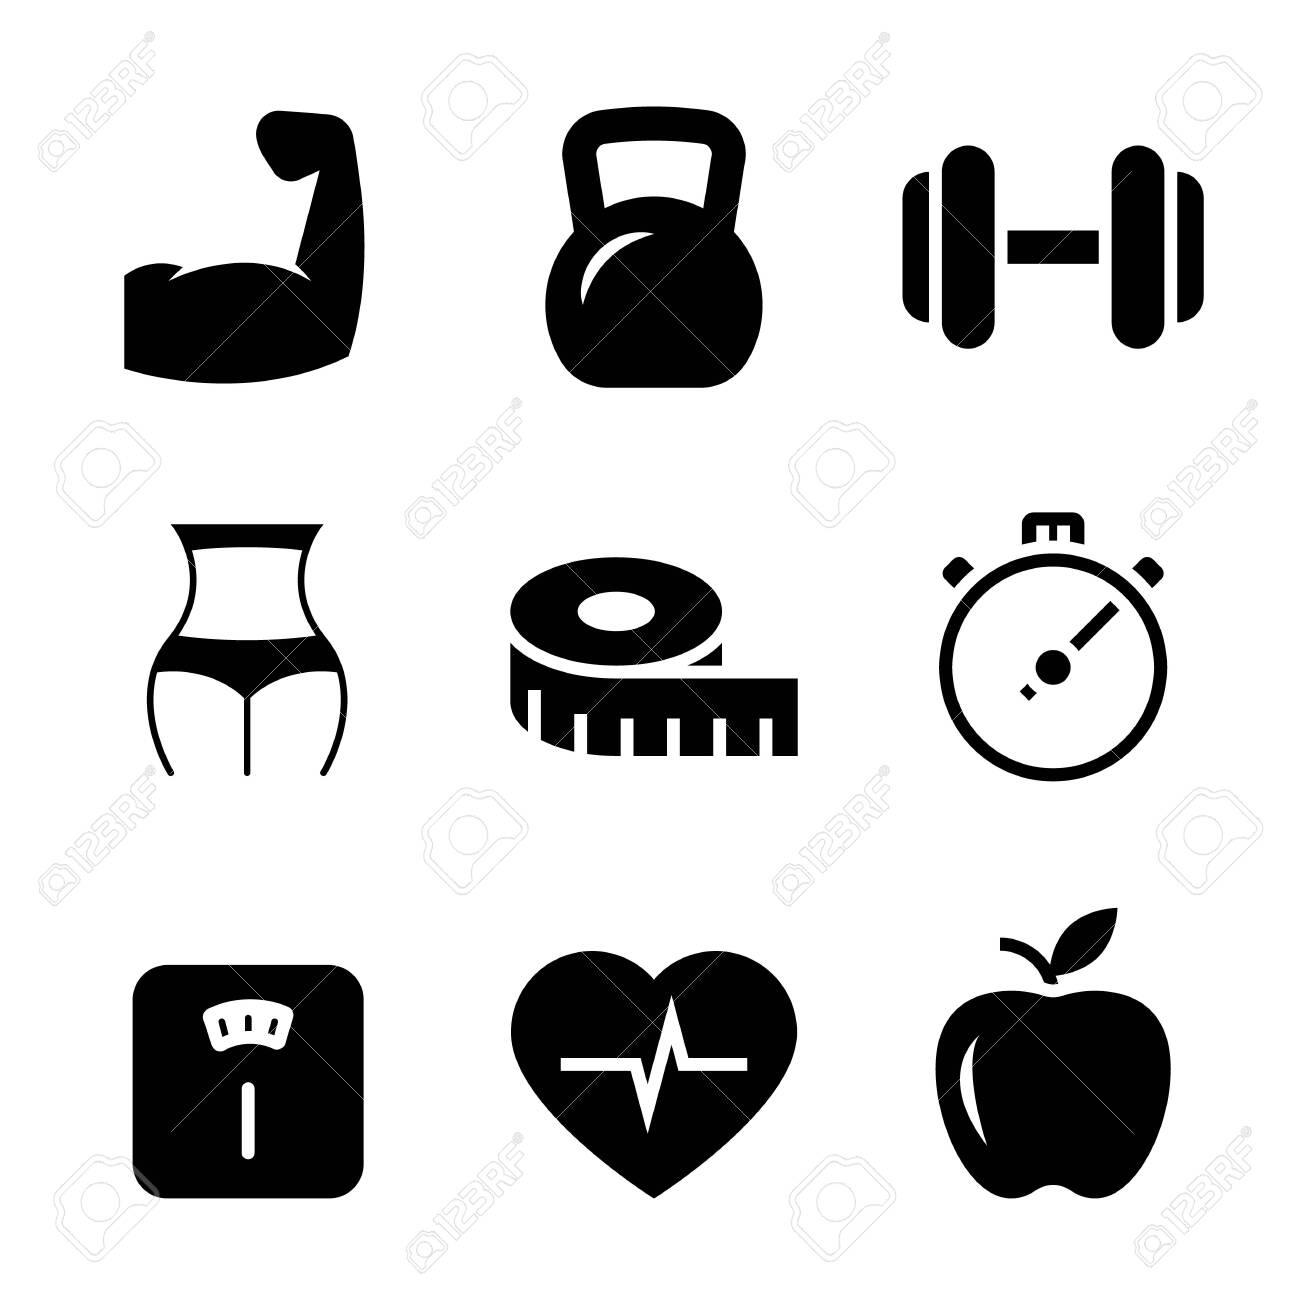 Fitness black icons on white background. Vector illustration - 137259163